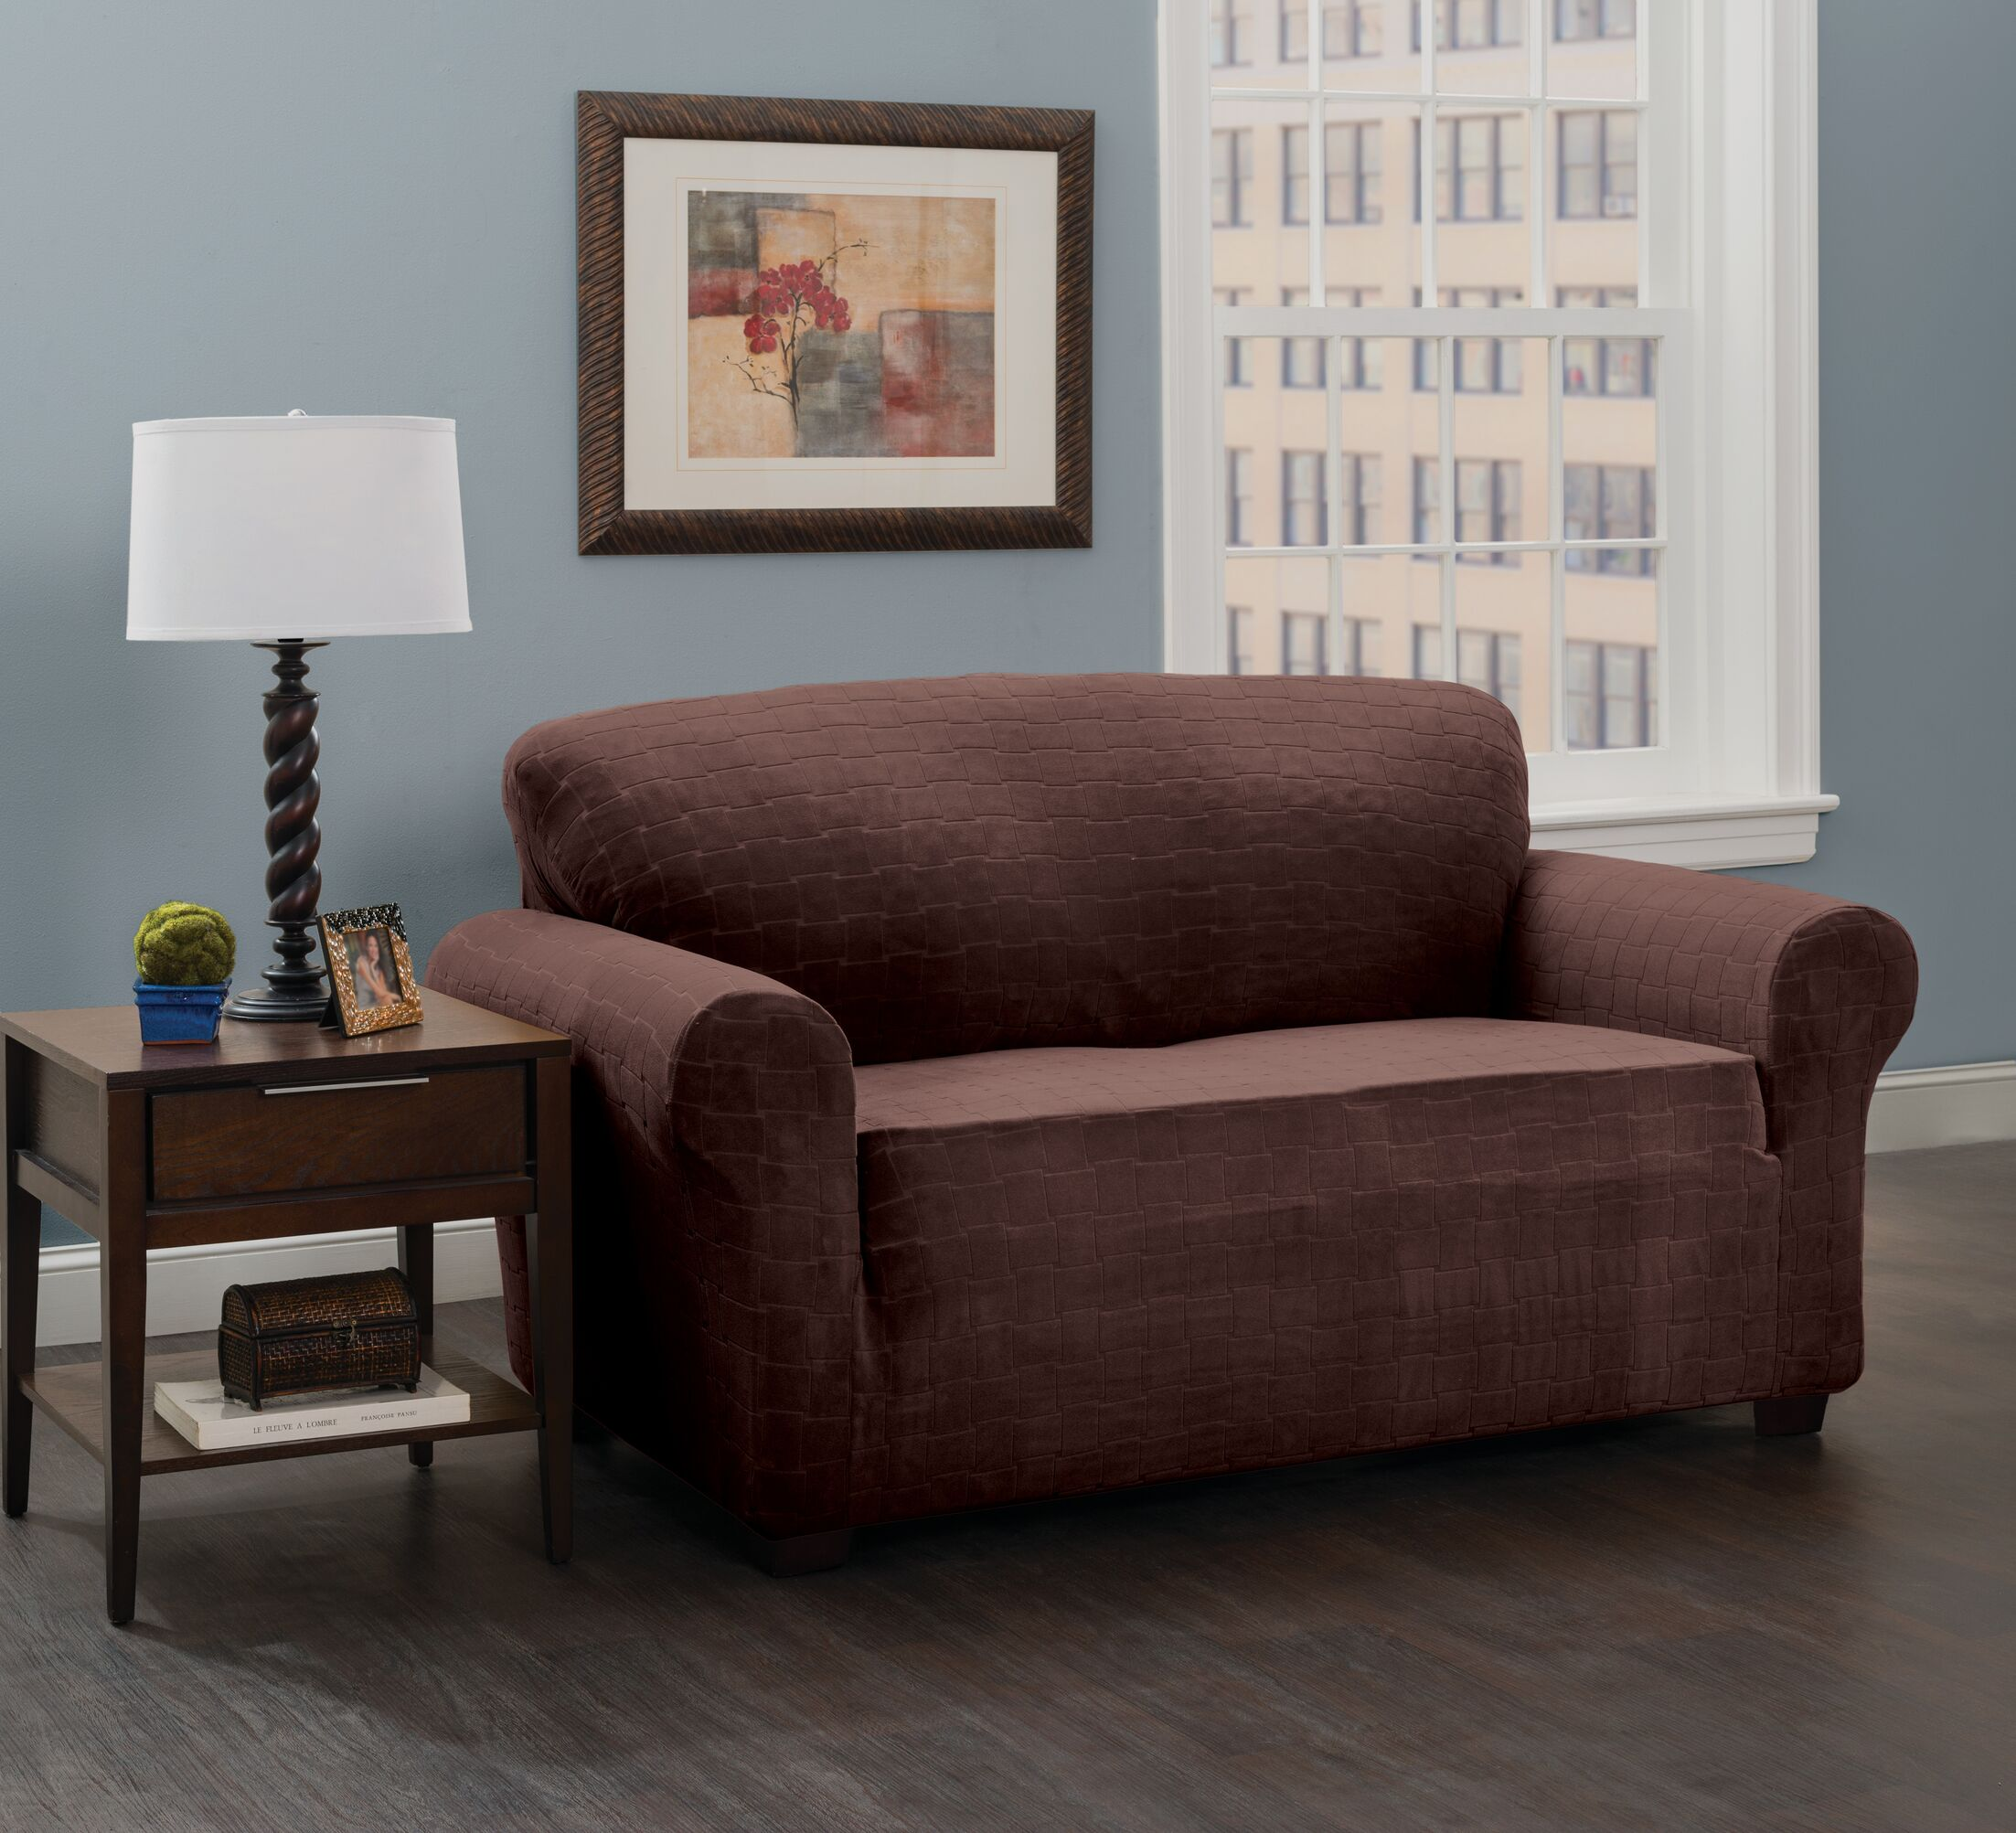 Box Cushion Loveseat Slipcover Upholstery: Chocolate/Cheks